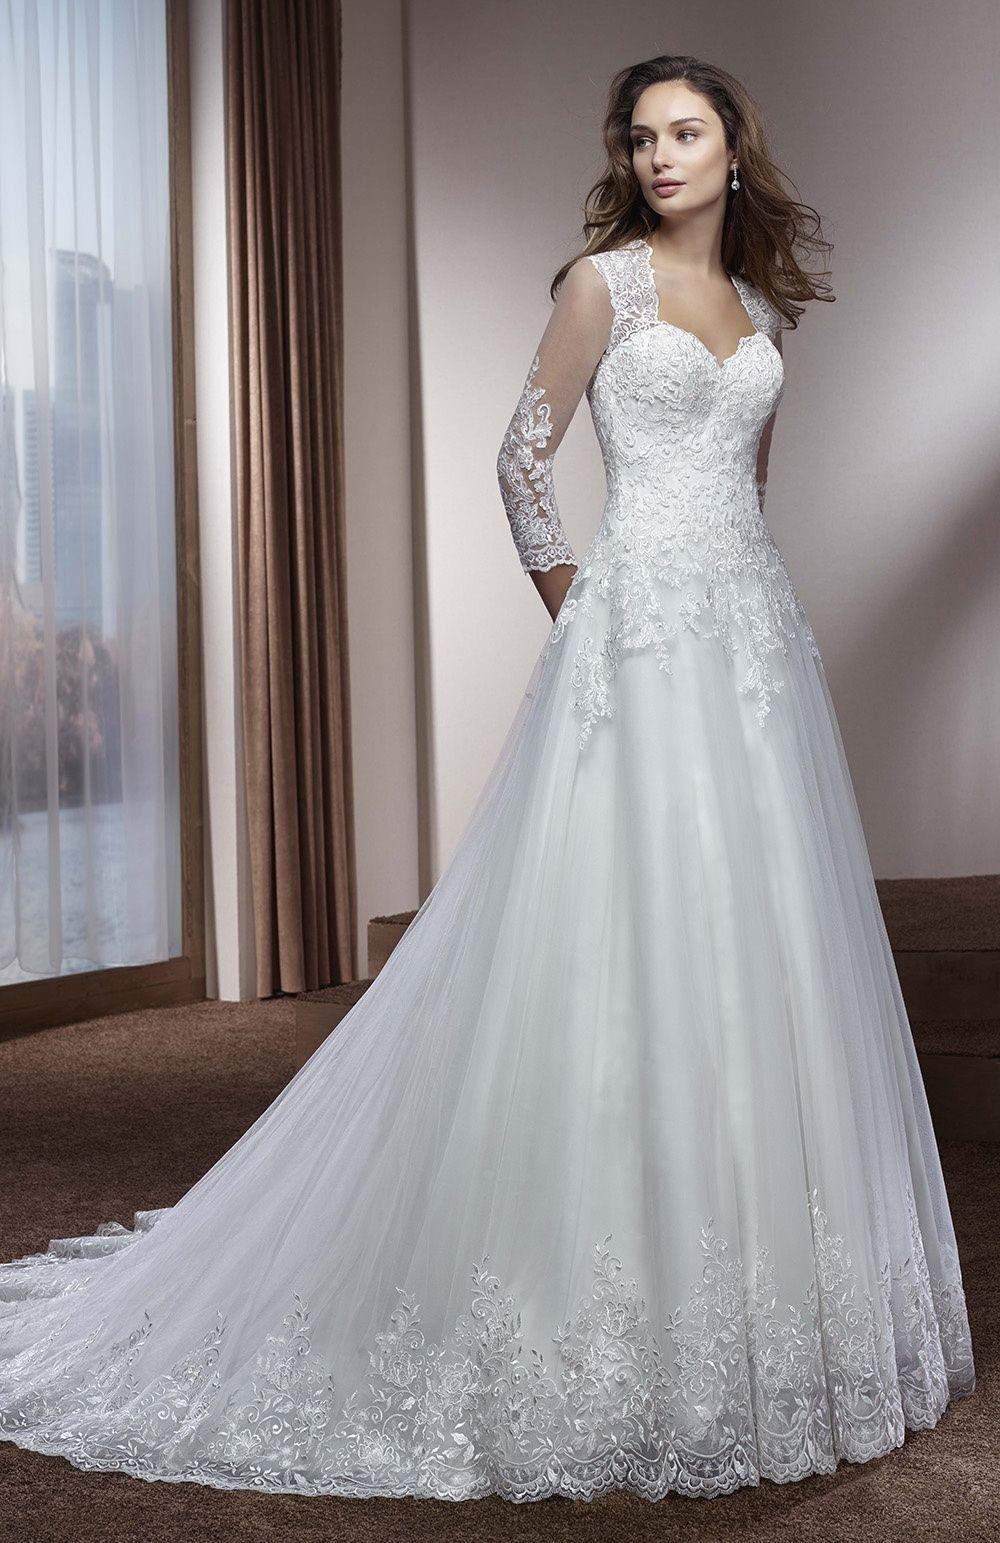 Robe De Mariee Divina Sposa 2018 Modele Wedding Dresses